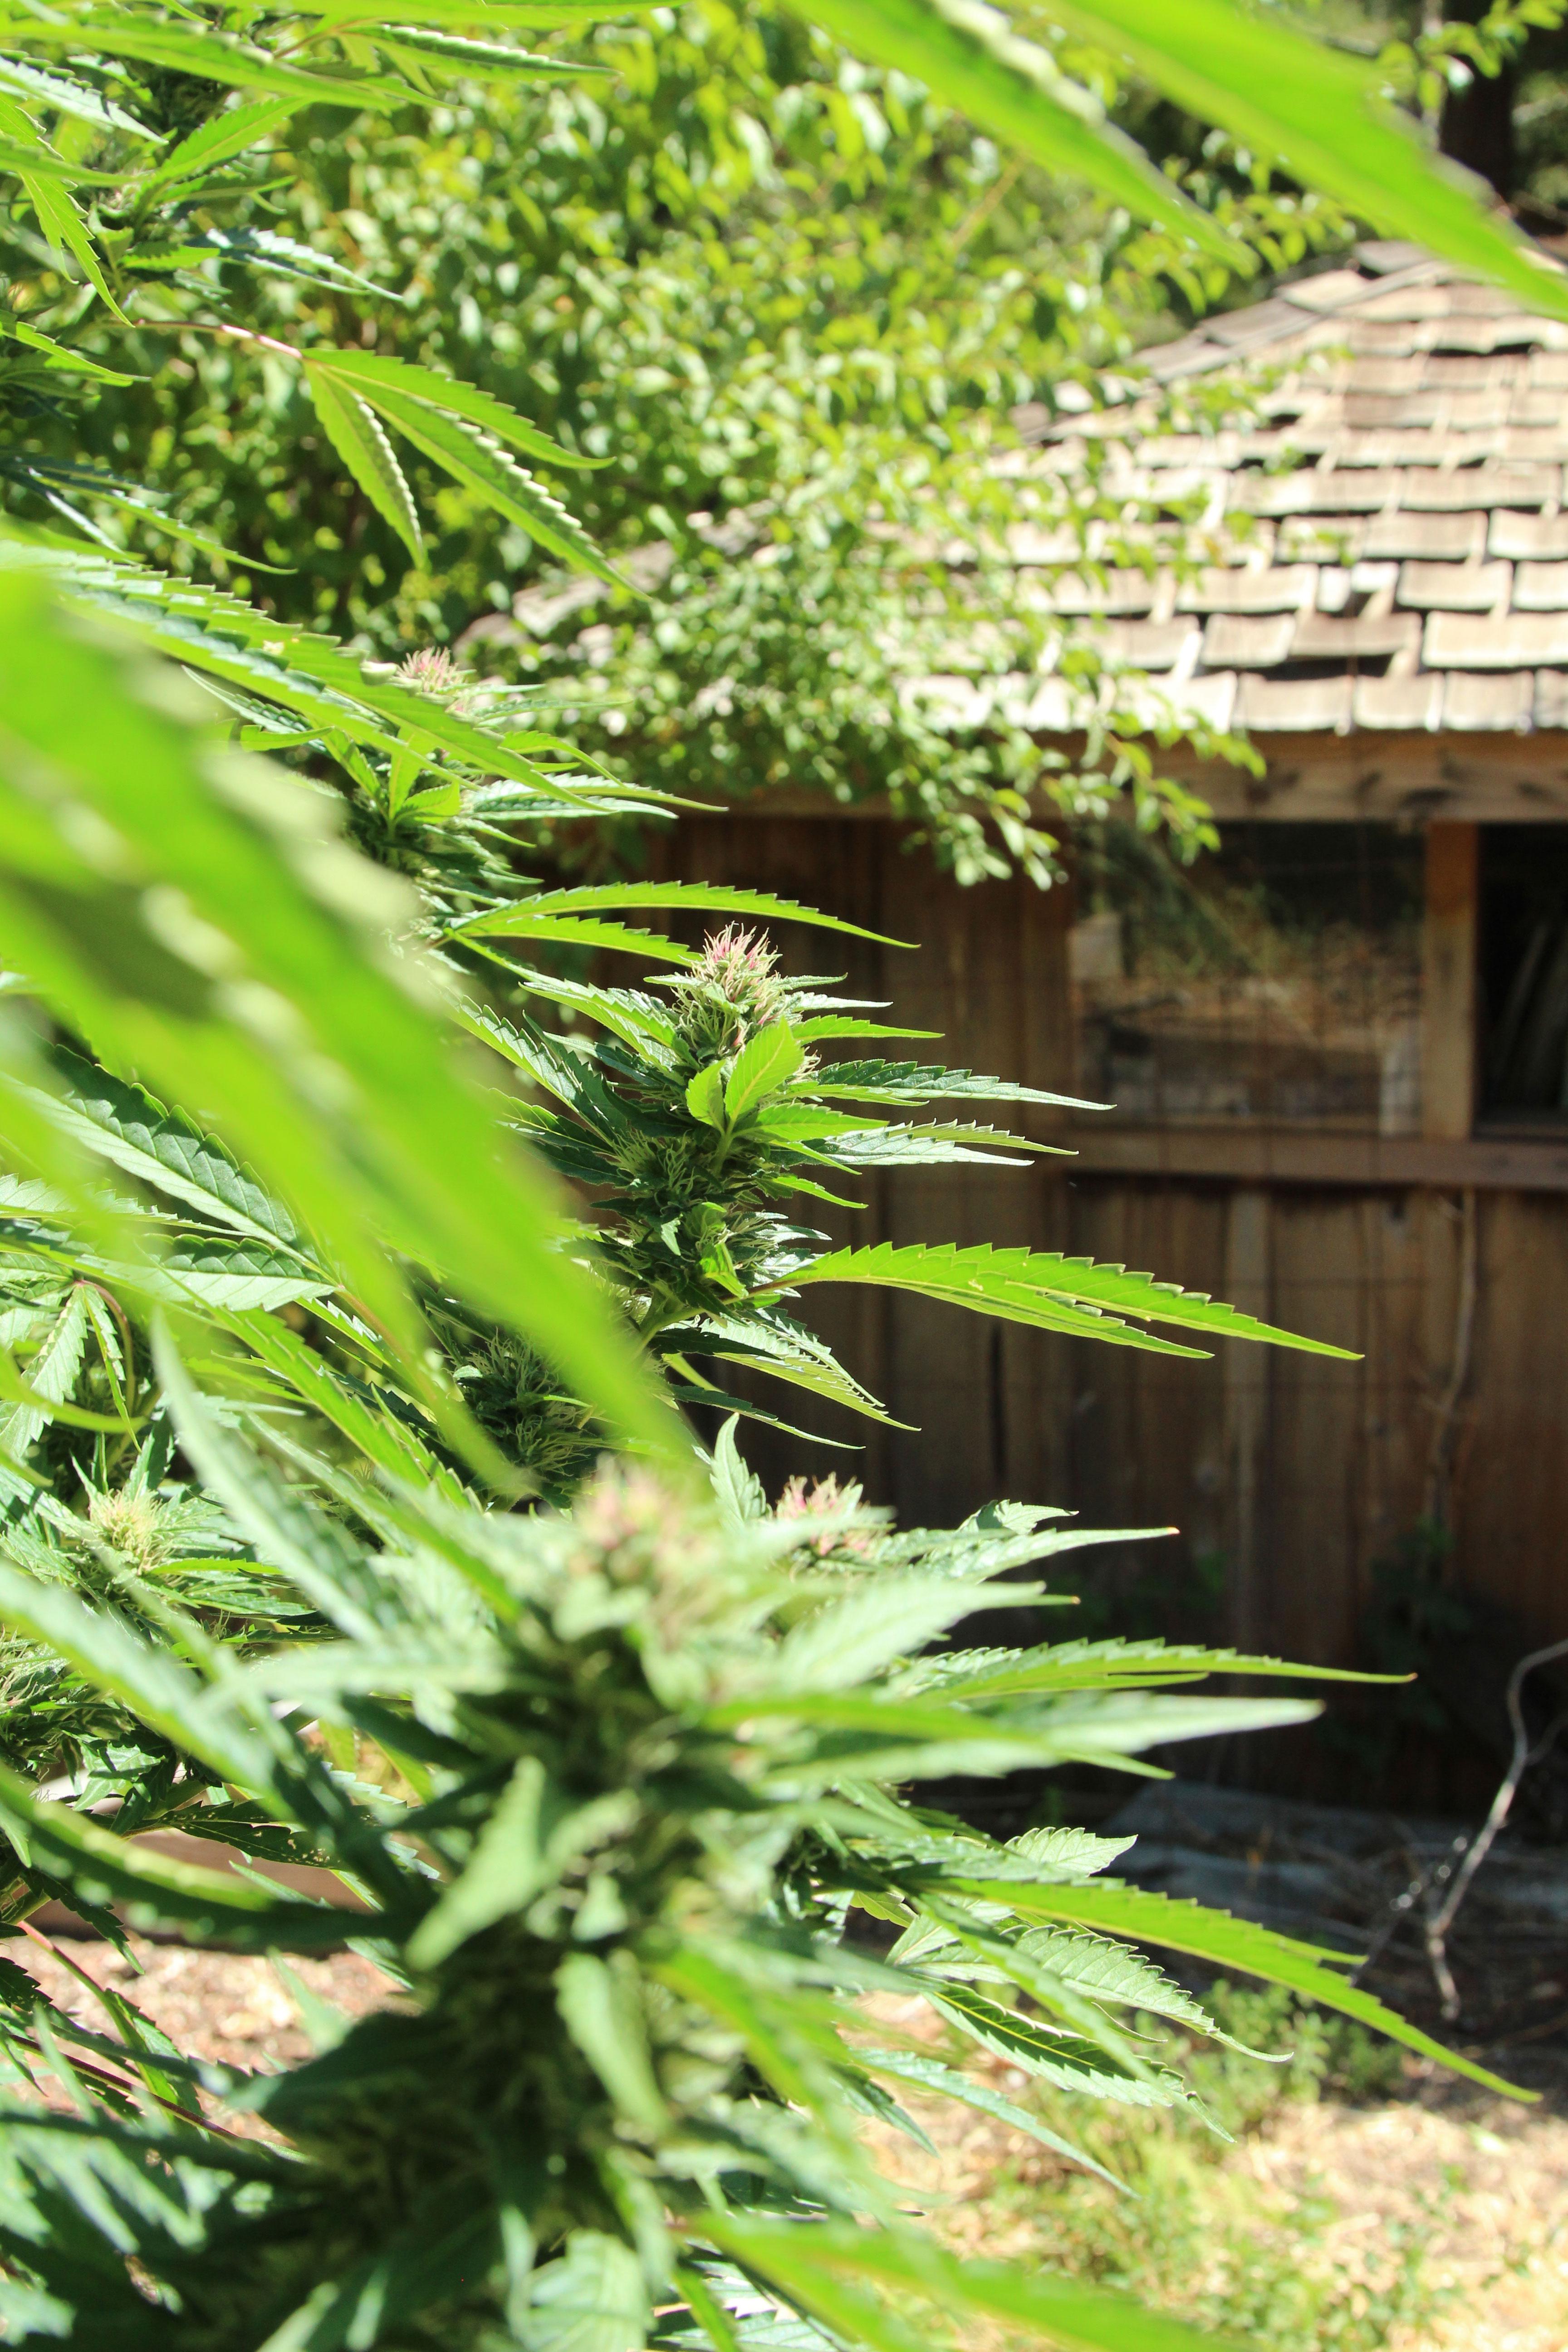 How to Grow Cannabis Outdoors - Sunset Magazine